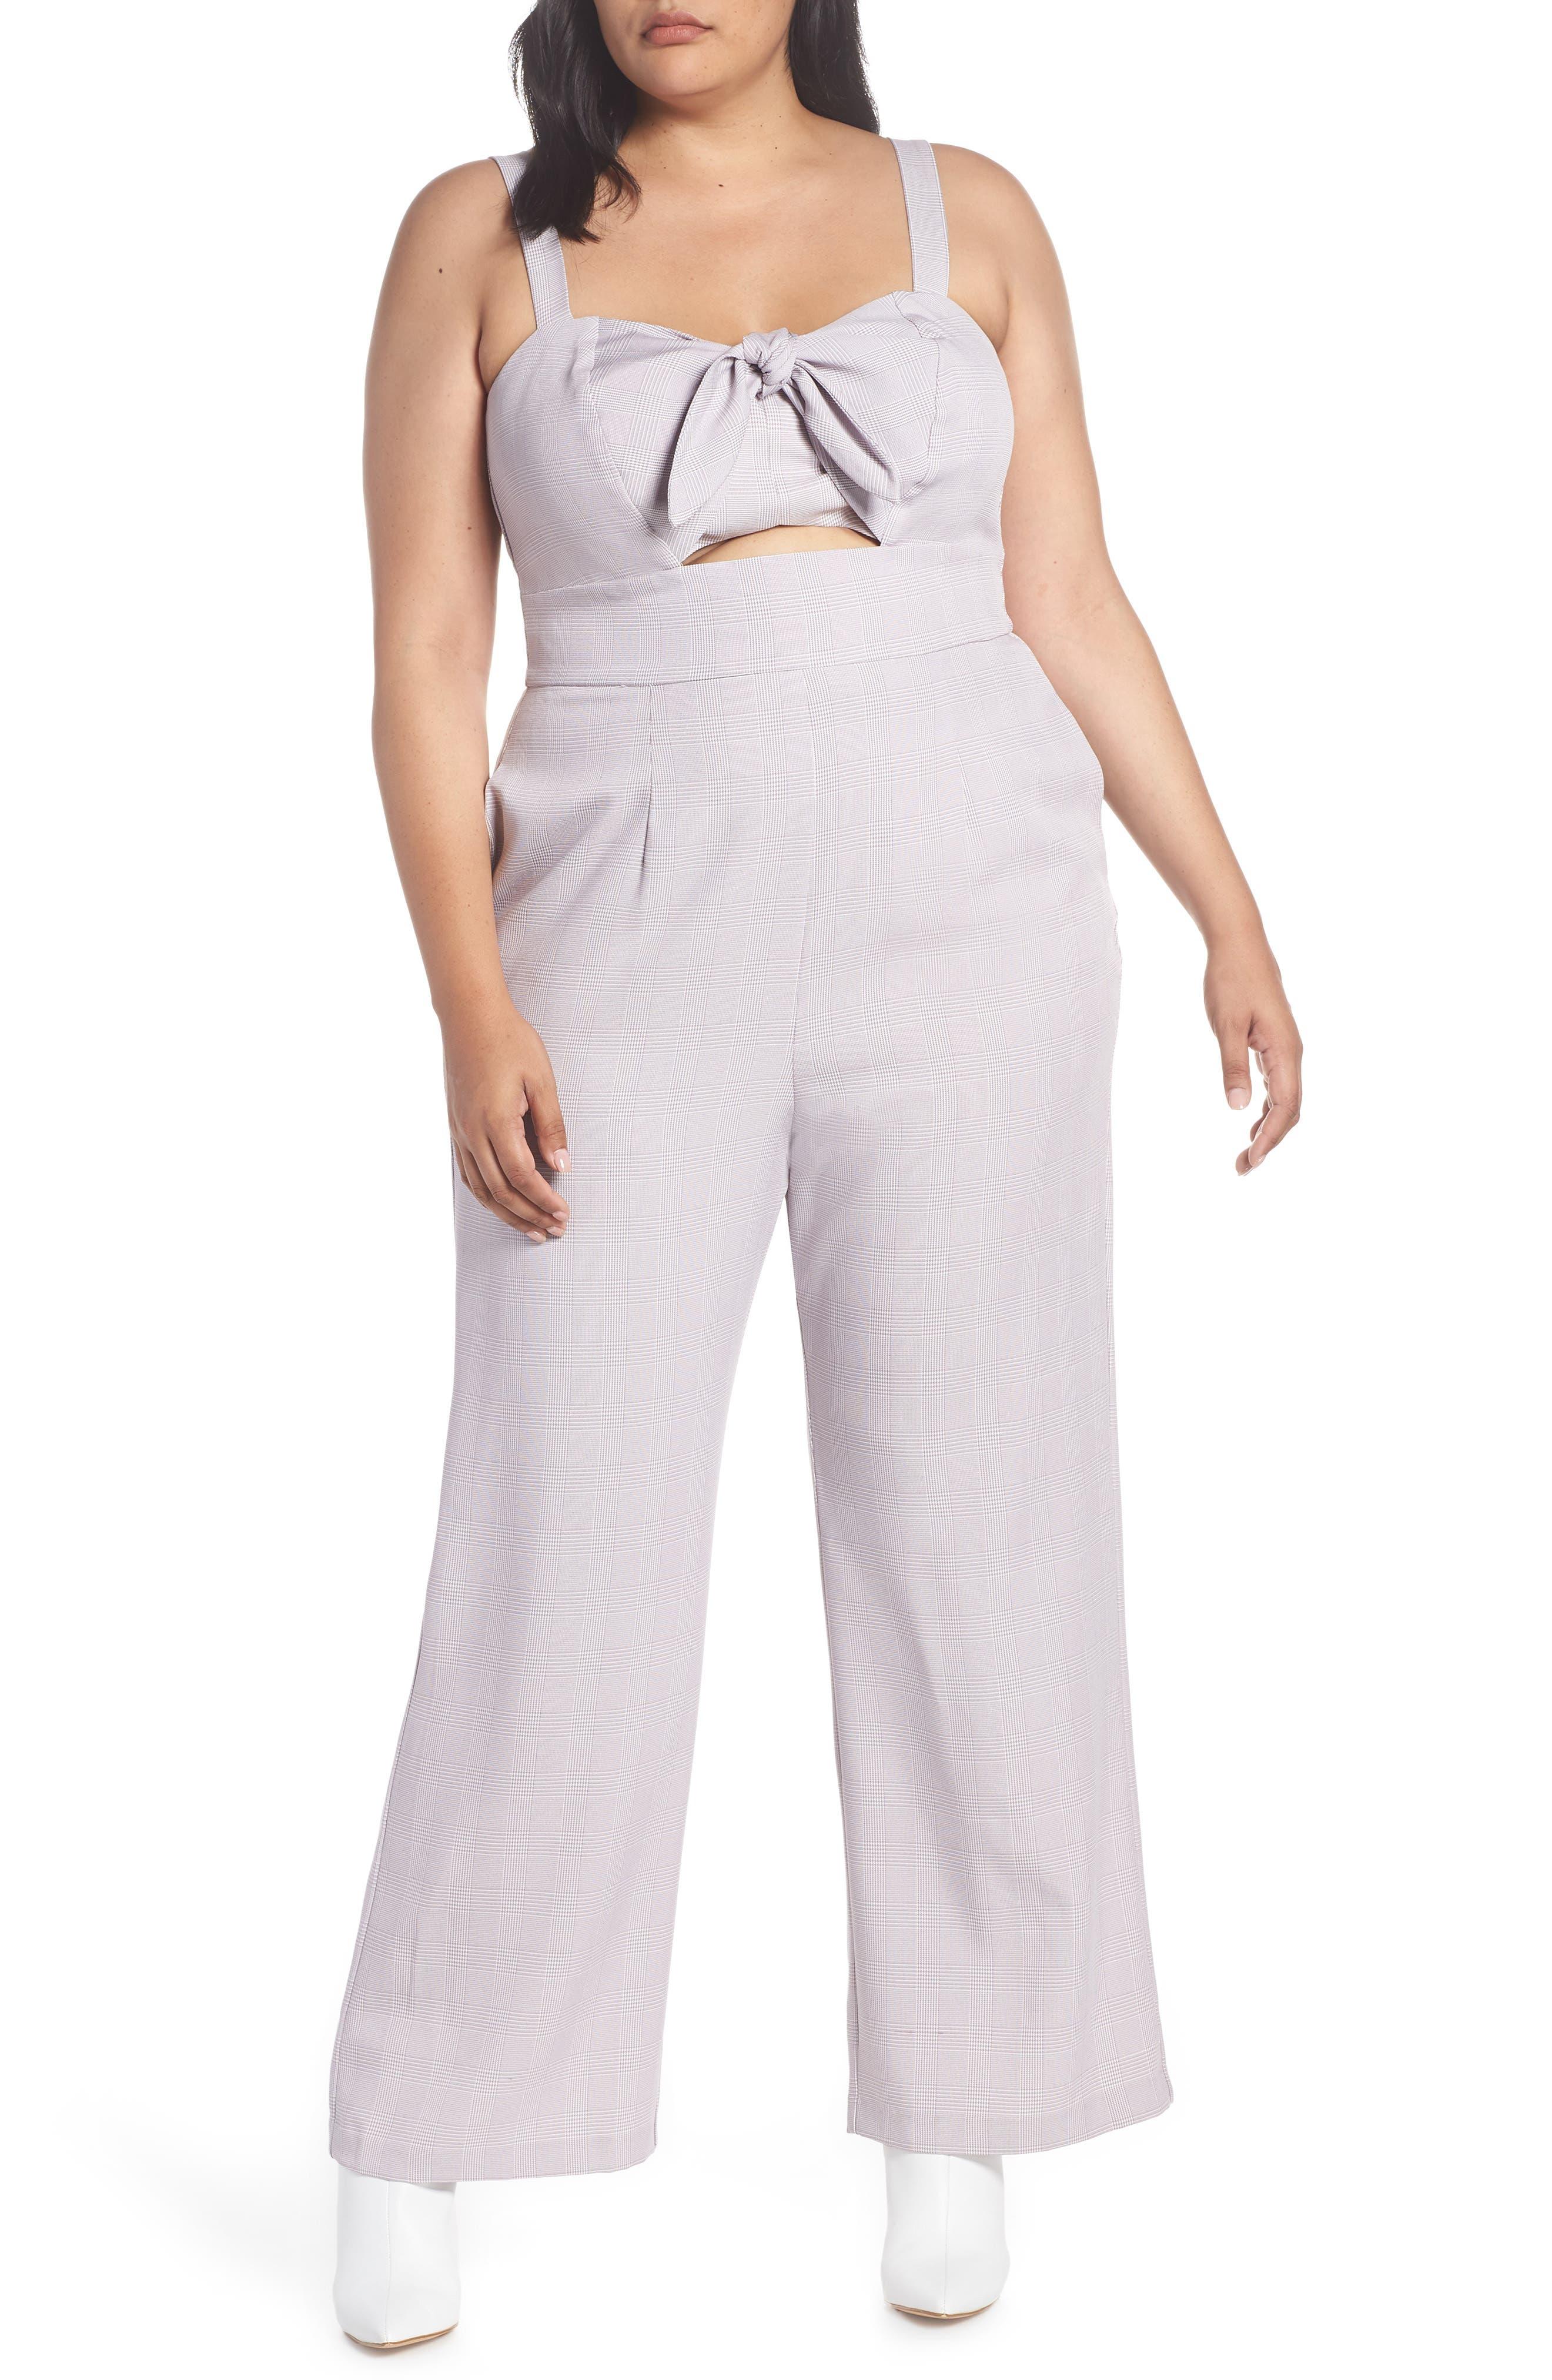 Roxy Jumpsuit,                         Main,                         color, LAVENDER TWEED